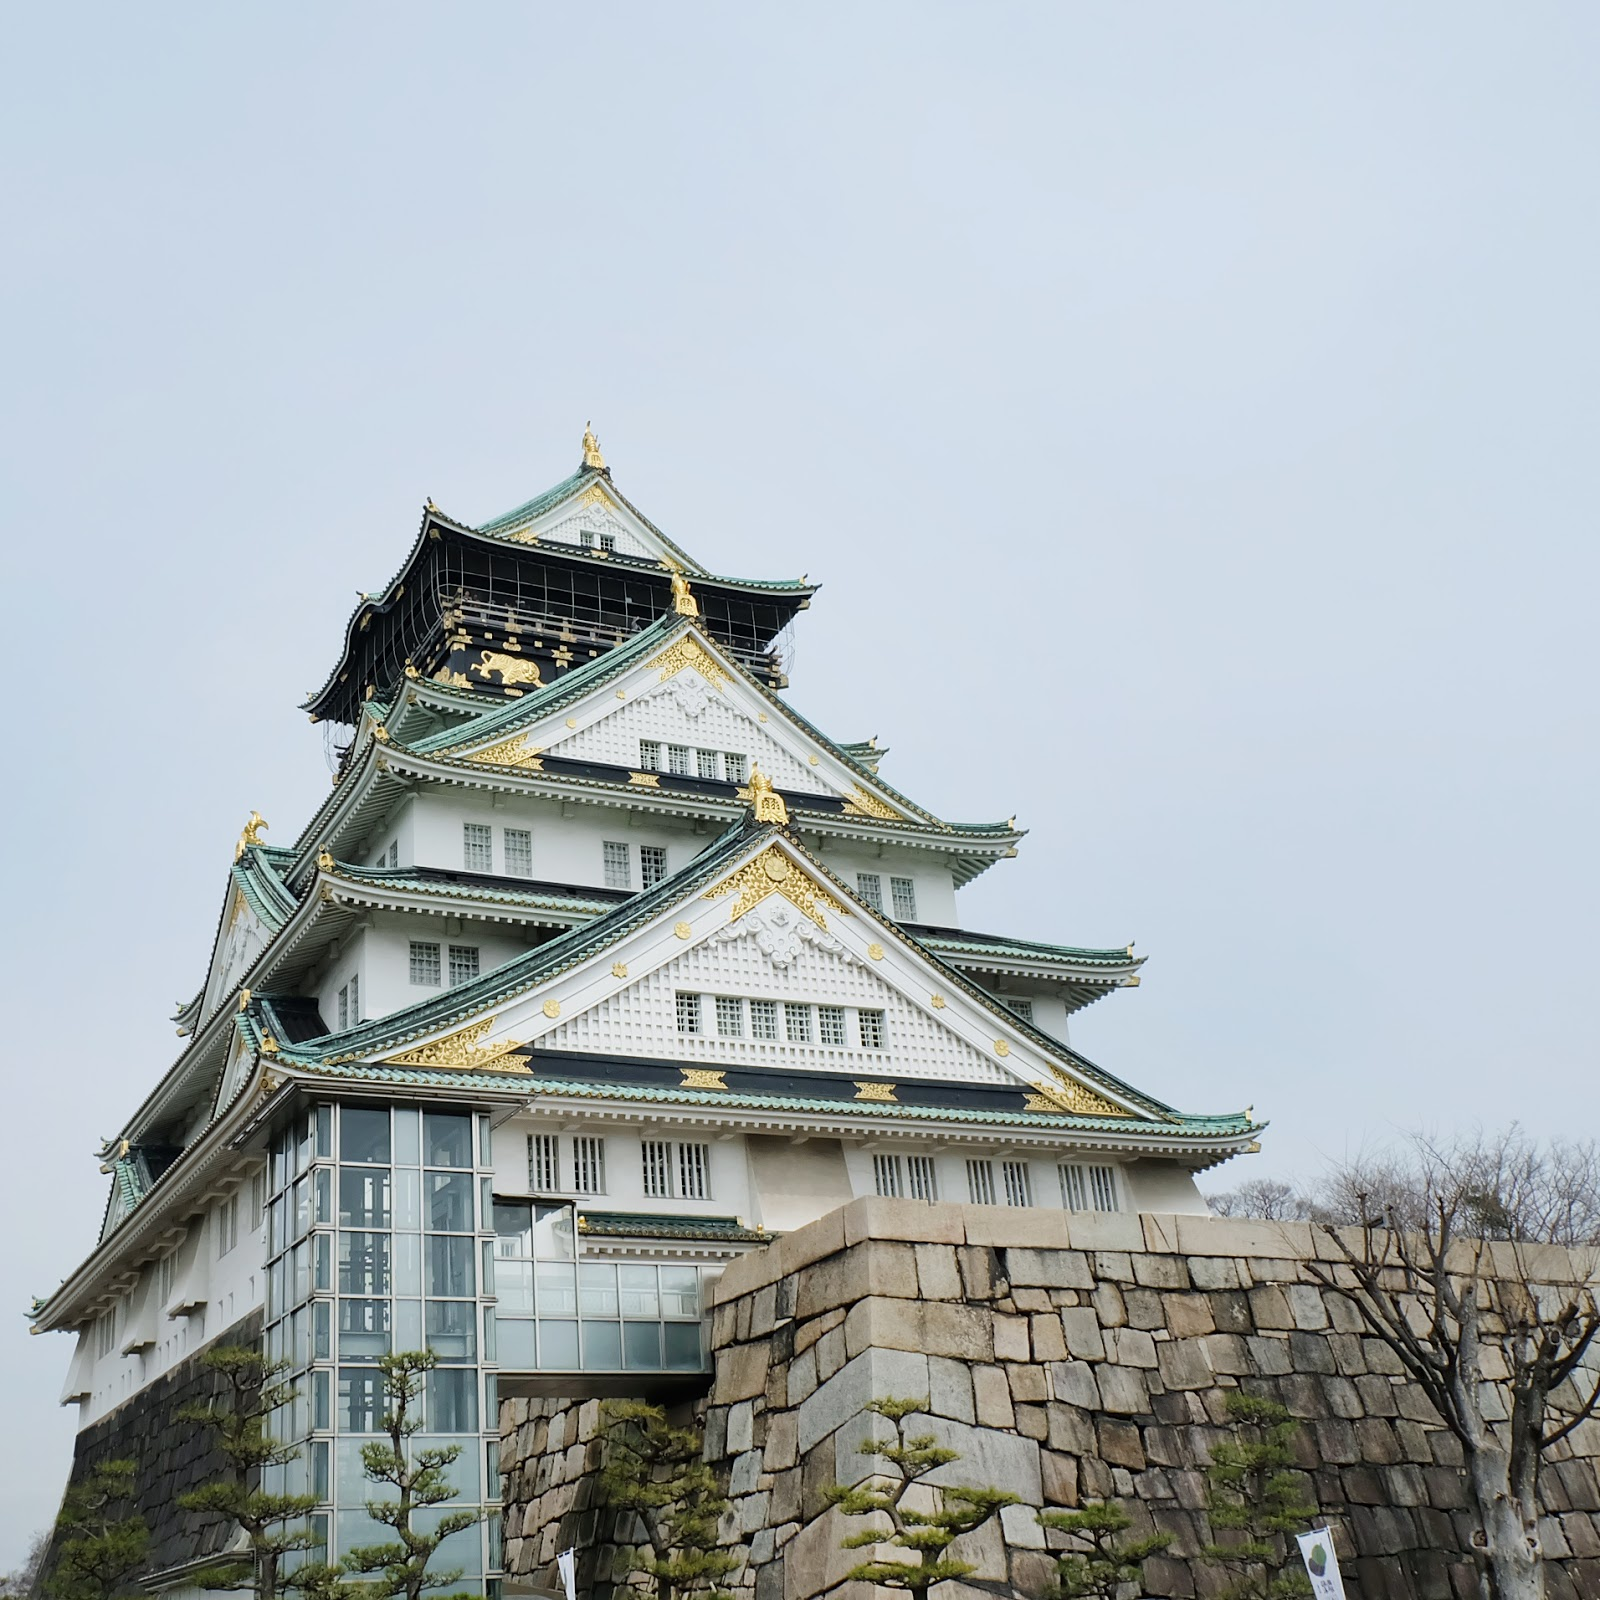 Japan 14 days itinerary osaka castle | www.bigdreamerblog.com